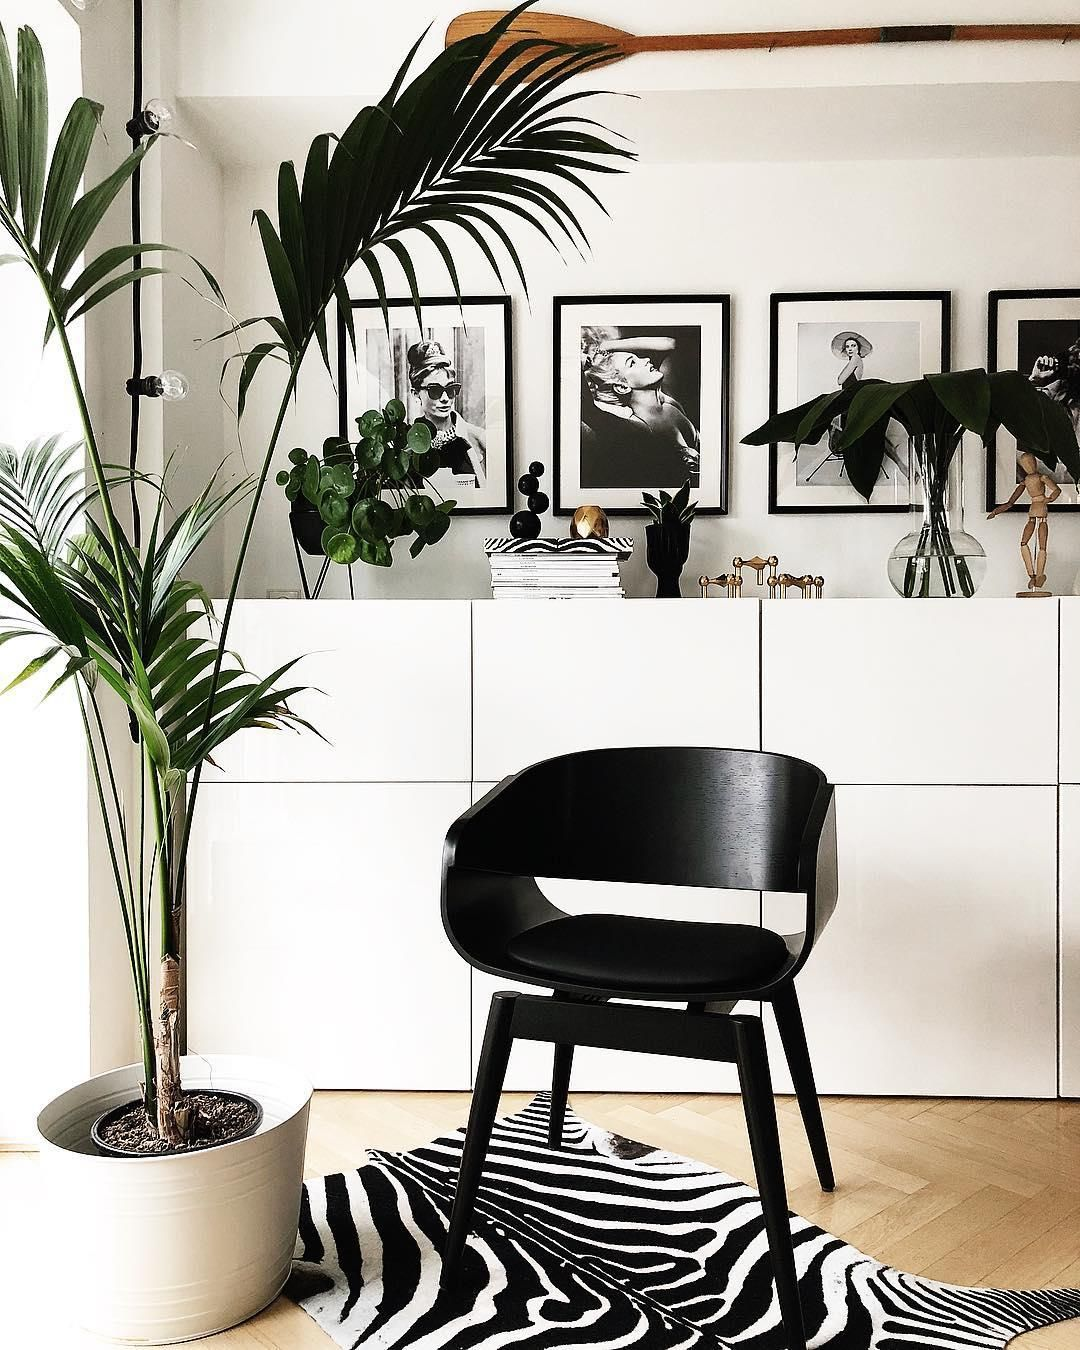 Wunderschöne Bilder, goldige Akzente, Pflanzen, elegante Deko